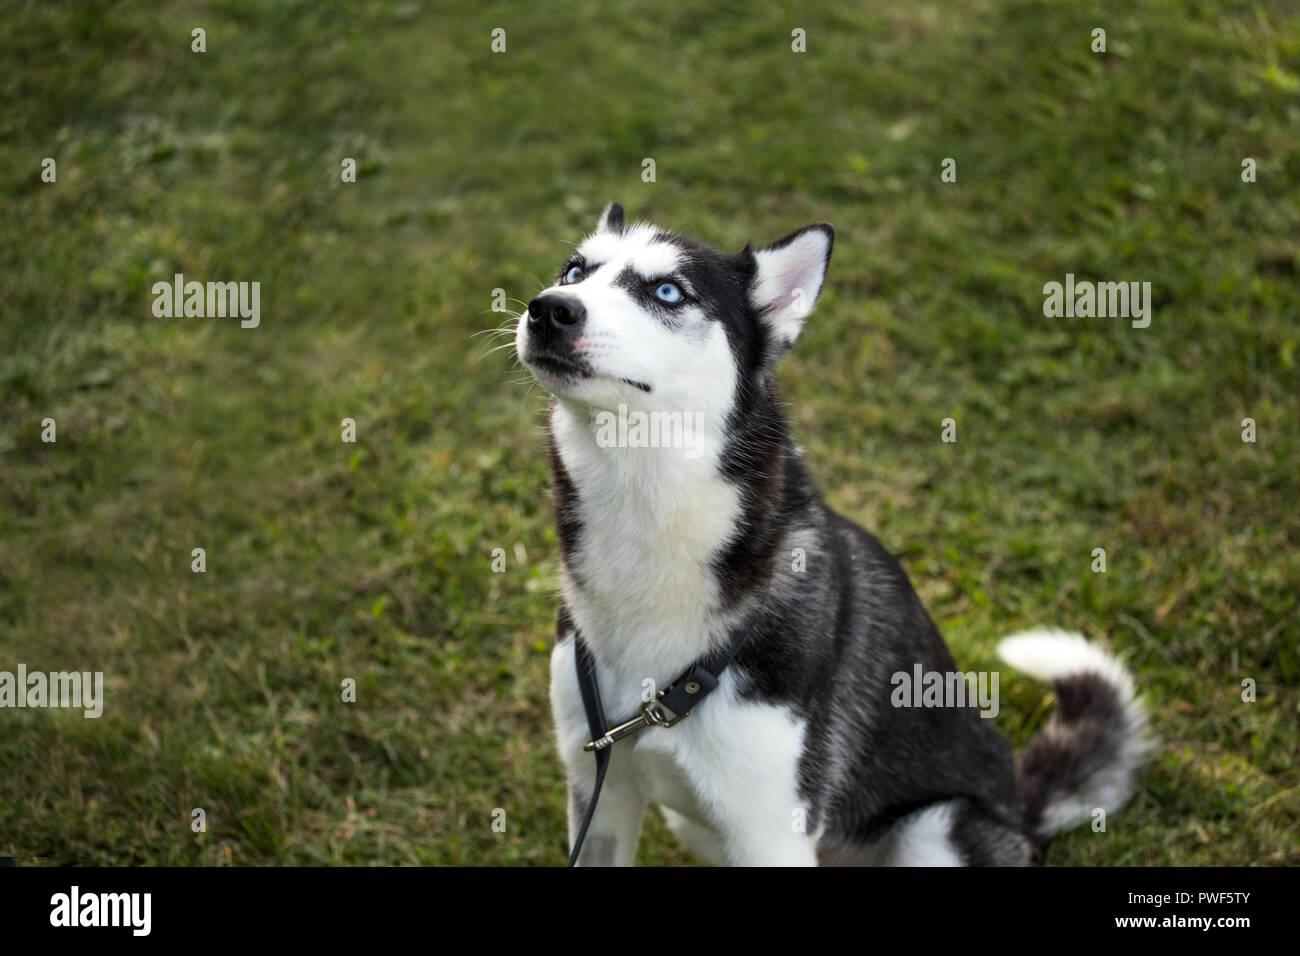 siberian husky dog - Stock Image